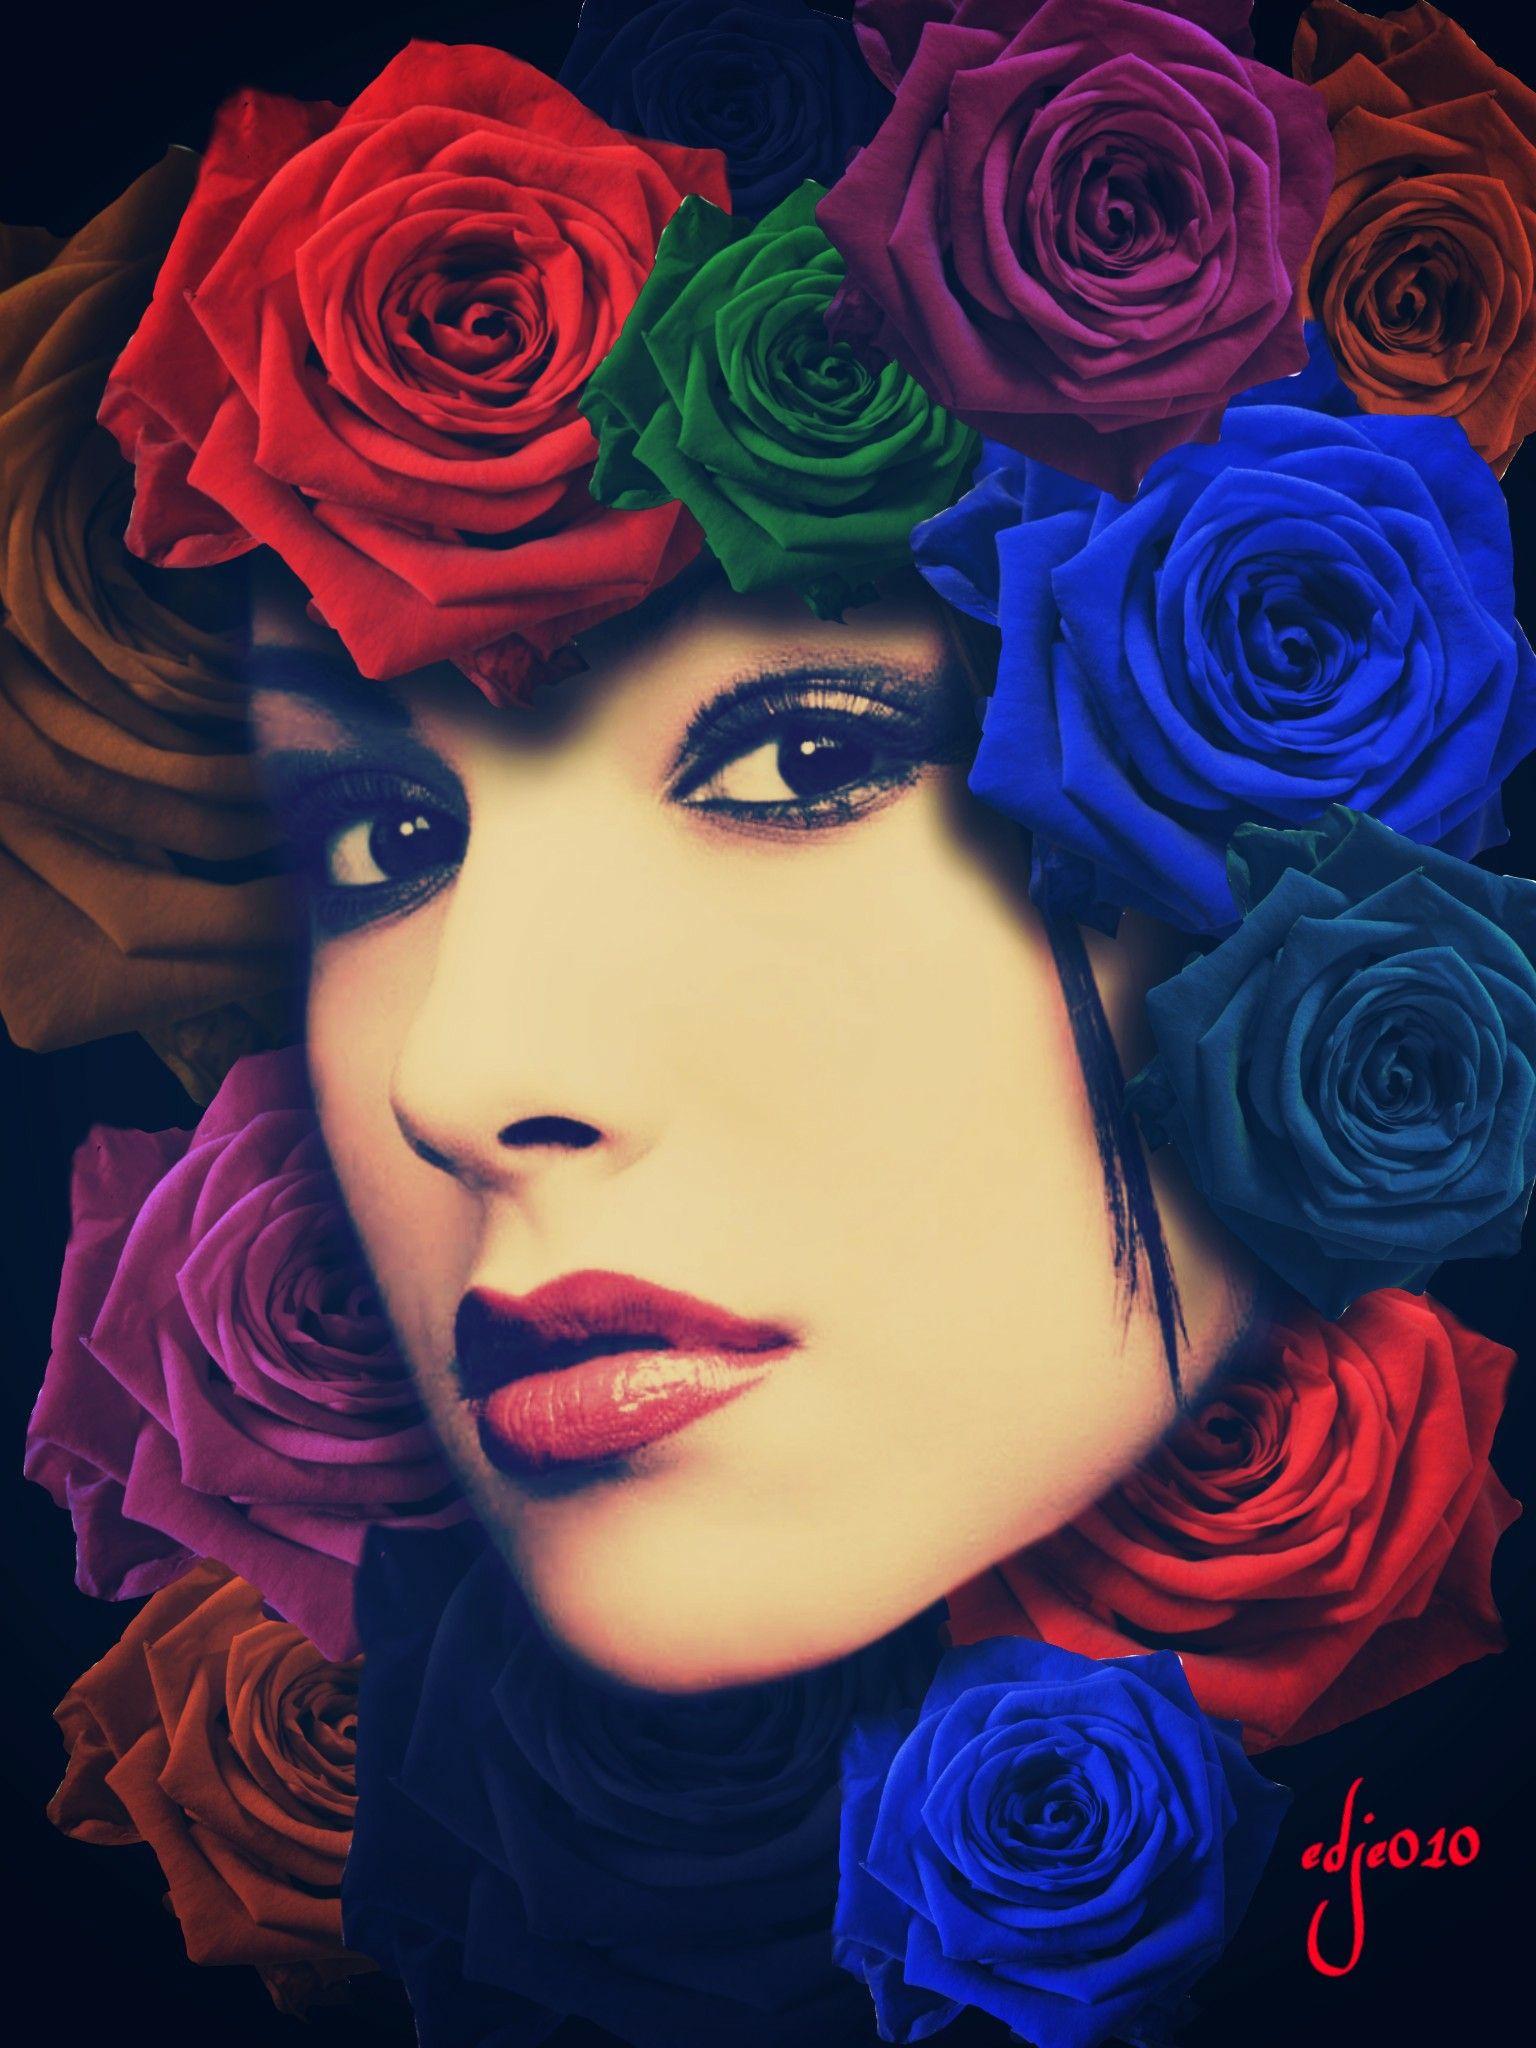 Check out edje010s image on picsart create your own for free https check out edje010s image on picsart create your own for free https flower crownsflower izmirmasajfo